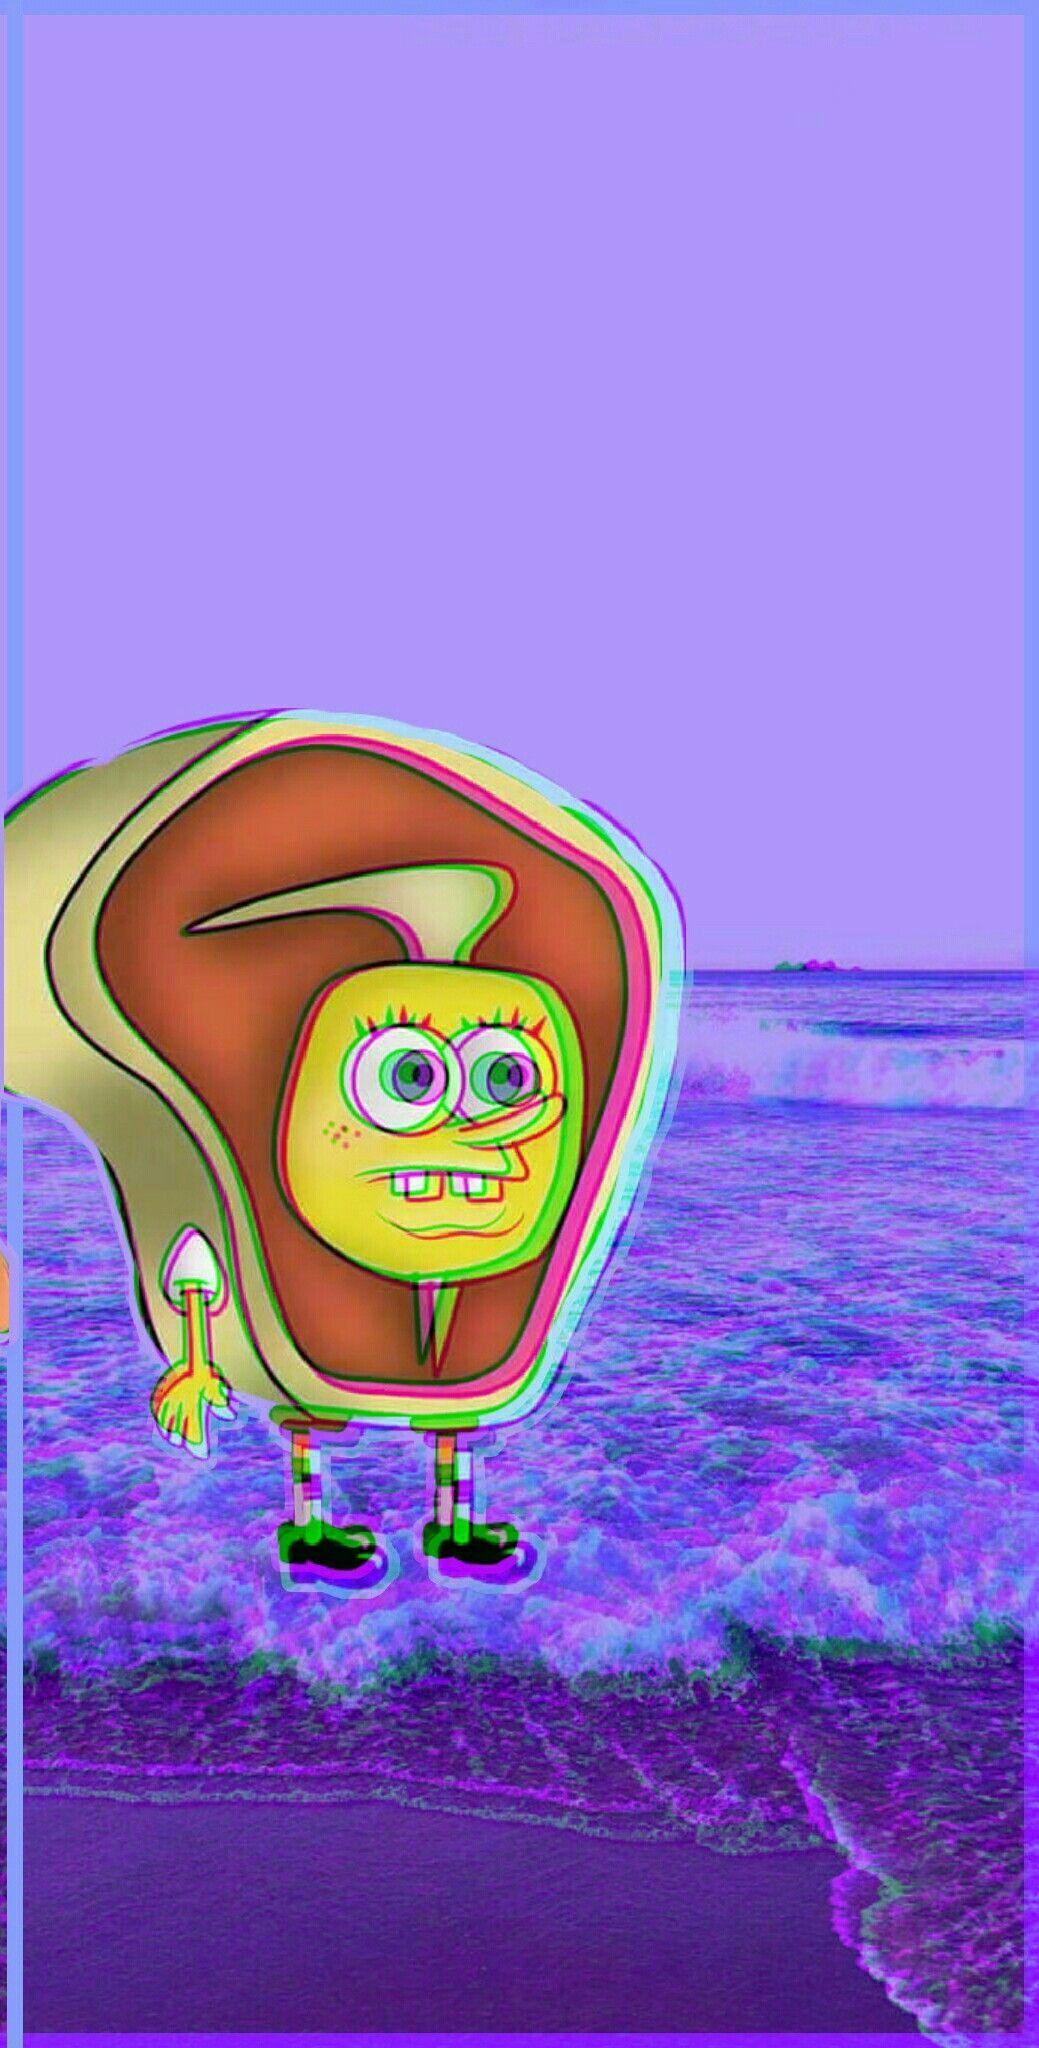 Bob Esponja Spongebob Wallpaper Cute Cartoon Wallpapers Cartoon Wallpaper